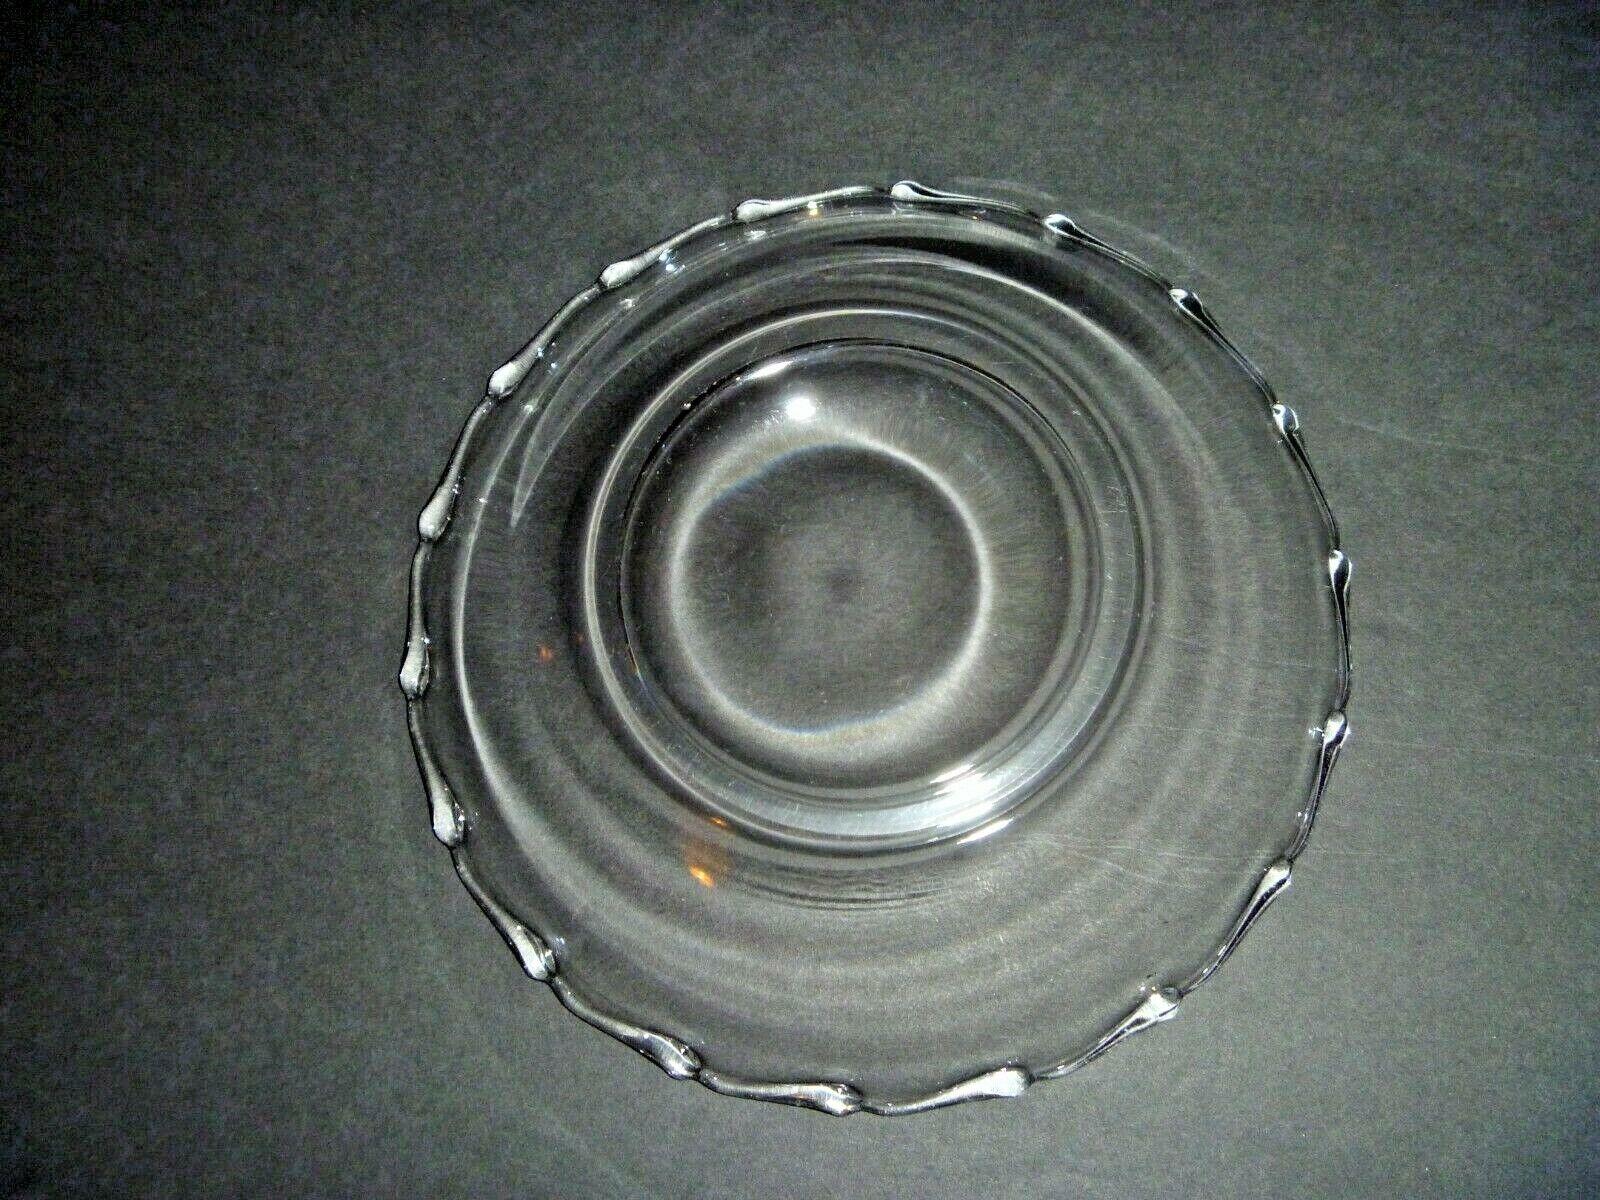 VINTAGE - FOSTORIA CENTURY - FLARED CLEAR GLASS BOWL - FRUIT BOWL - MID CENTURY - $1.99